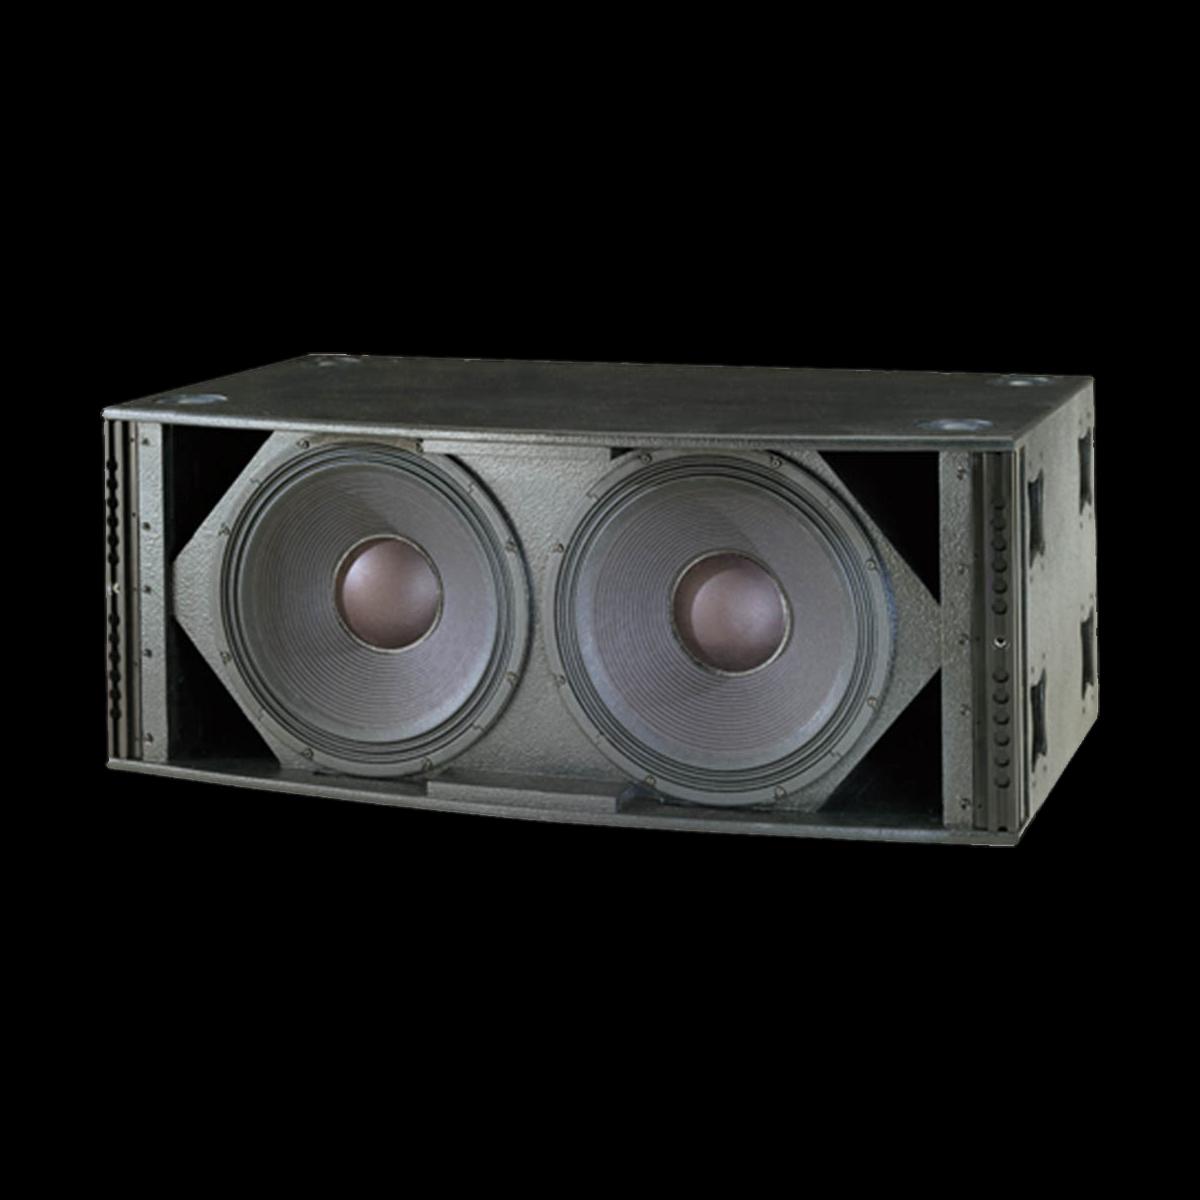 electrovoice phoenix xsub grille voor luidsprekerhoes baseline